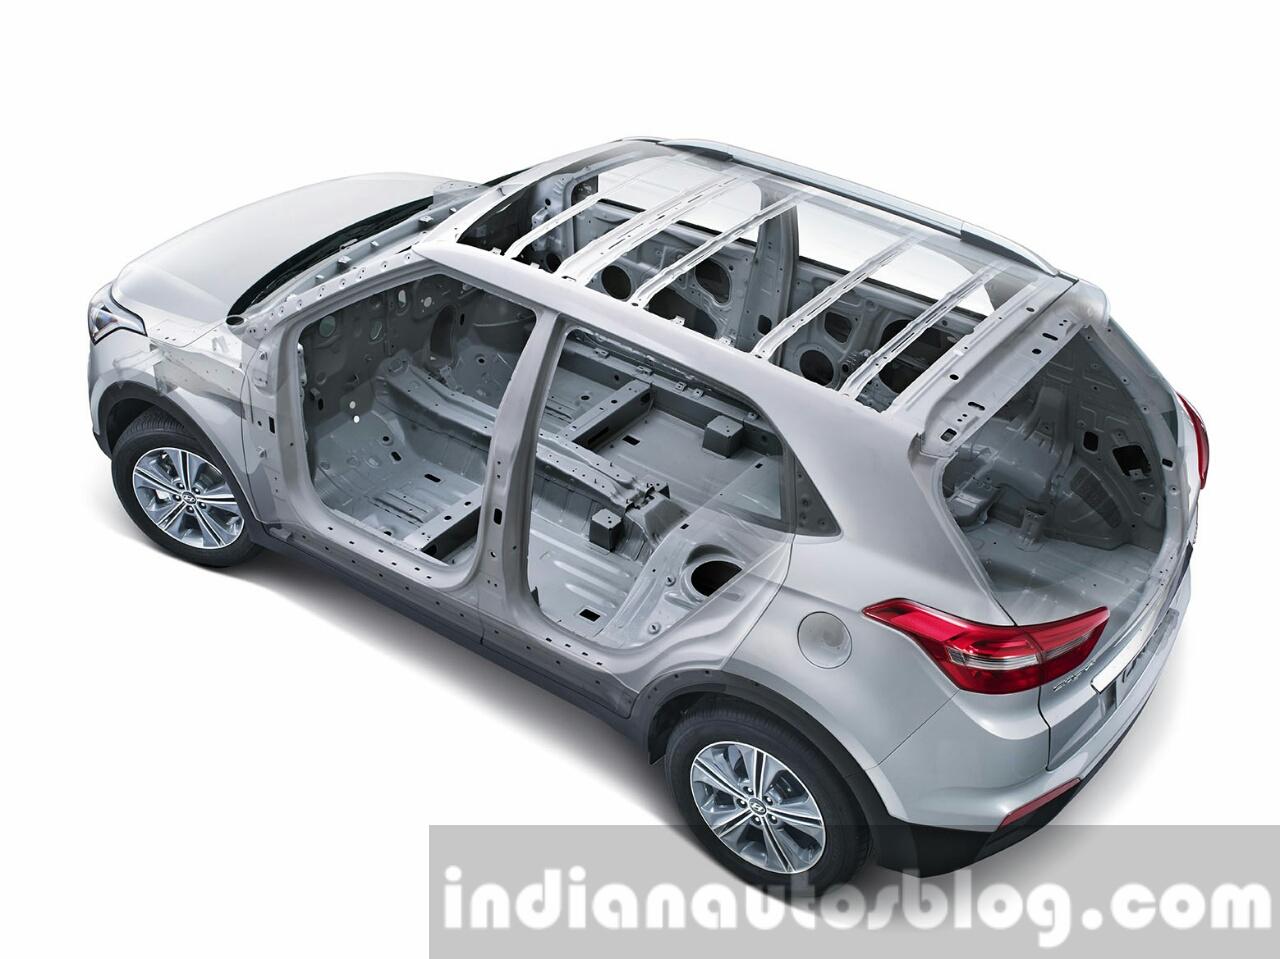 2015 Hyundai Creta HIVE body structure unveiled press image